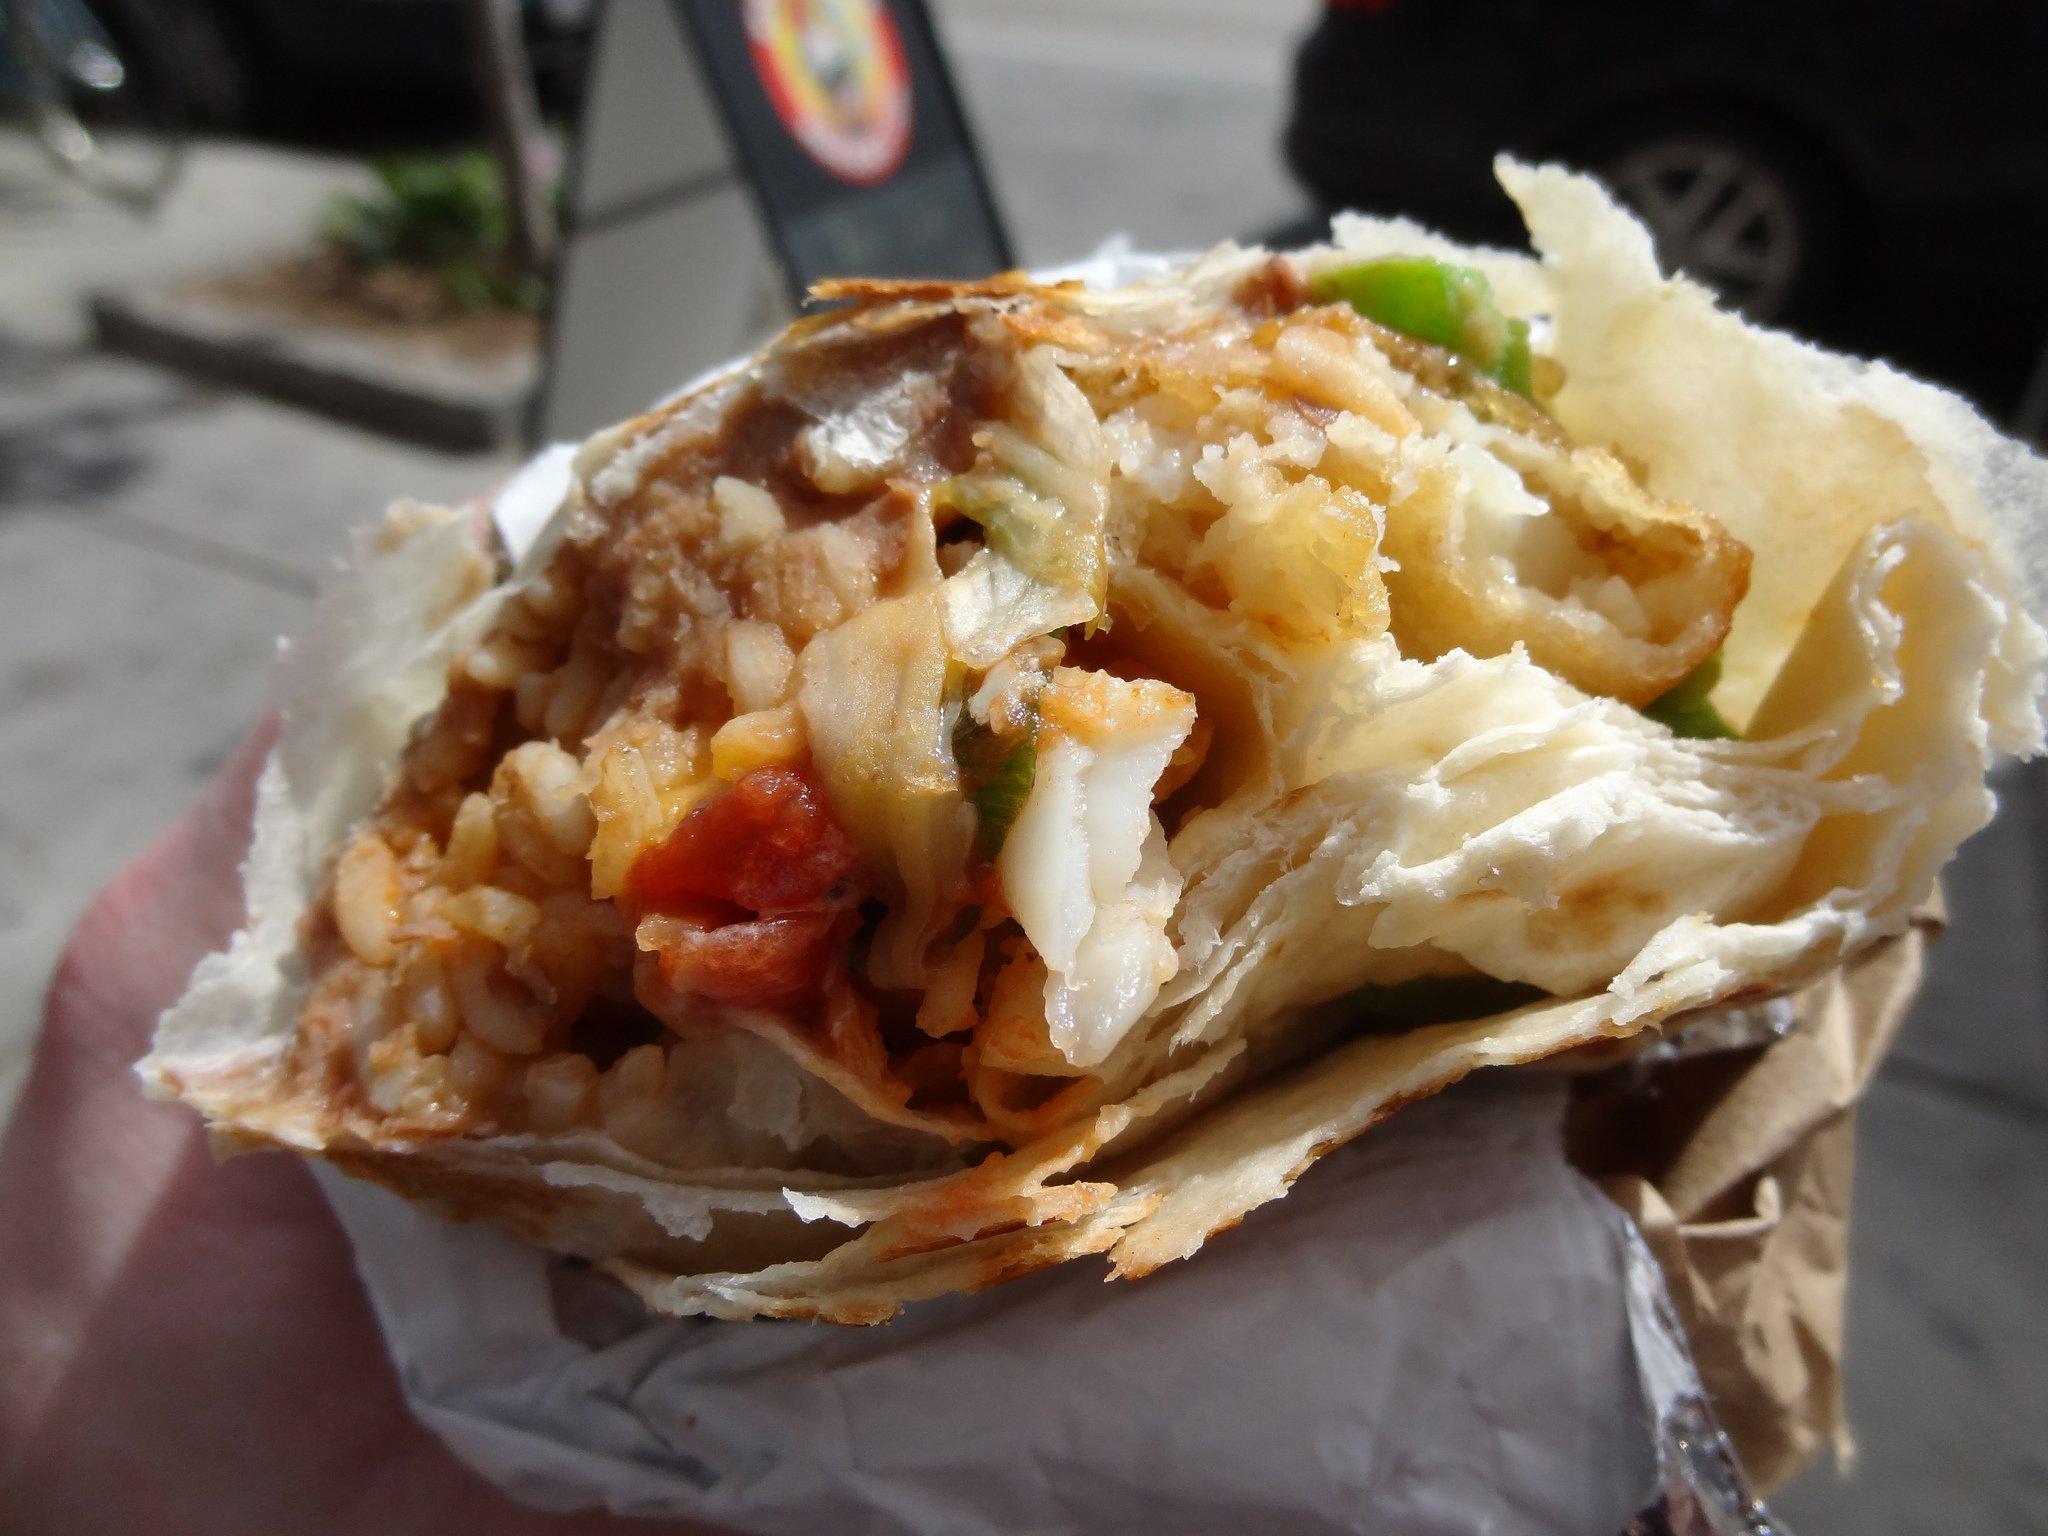 Toronto burrito food